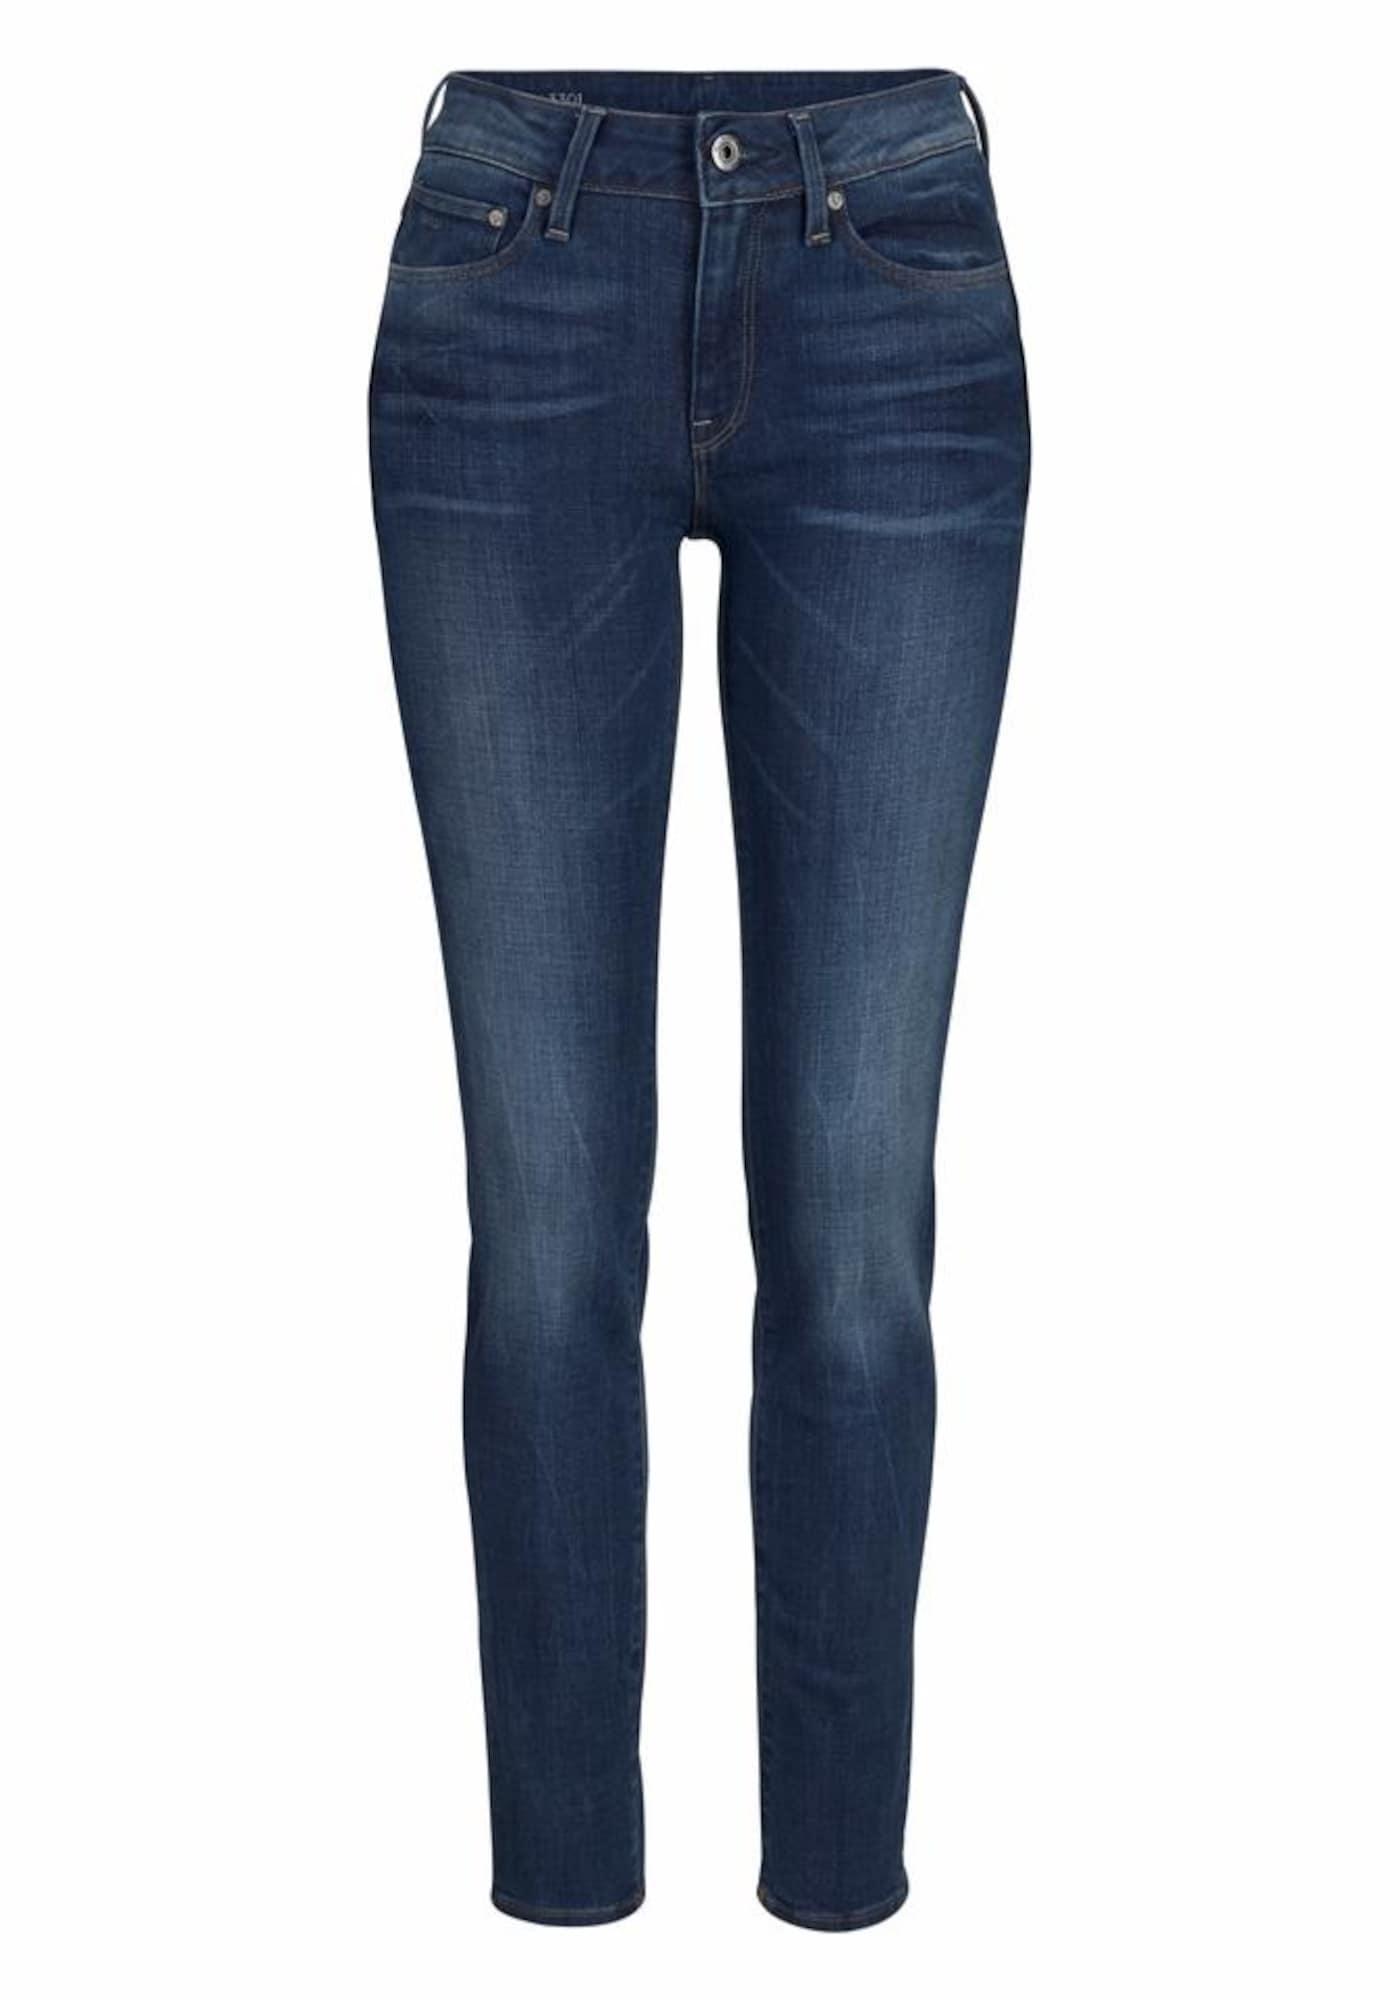 G-STAR RAW Dames Jeans 3301 blue denim